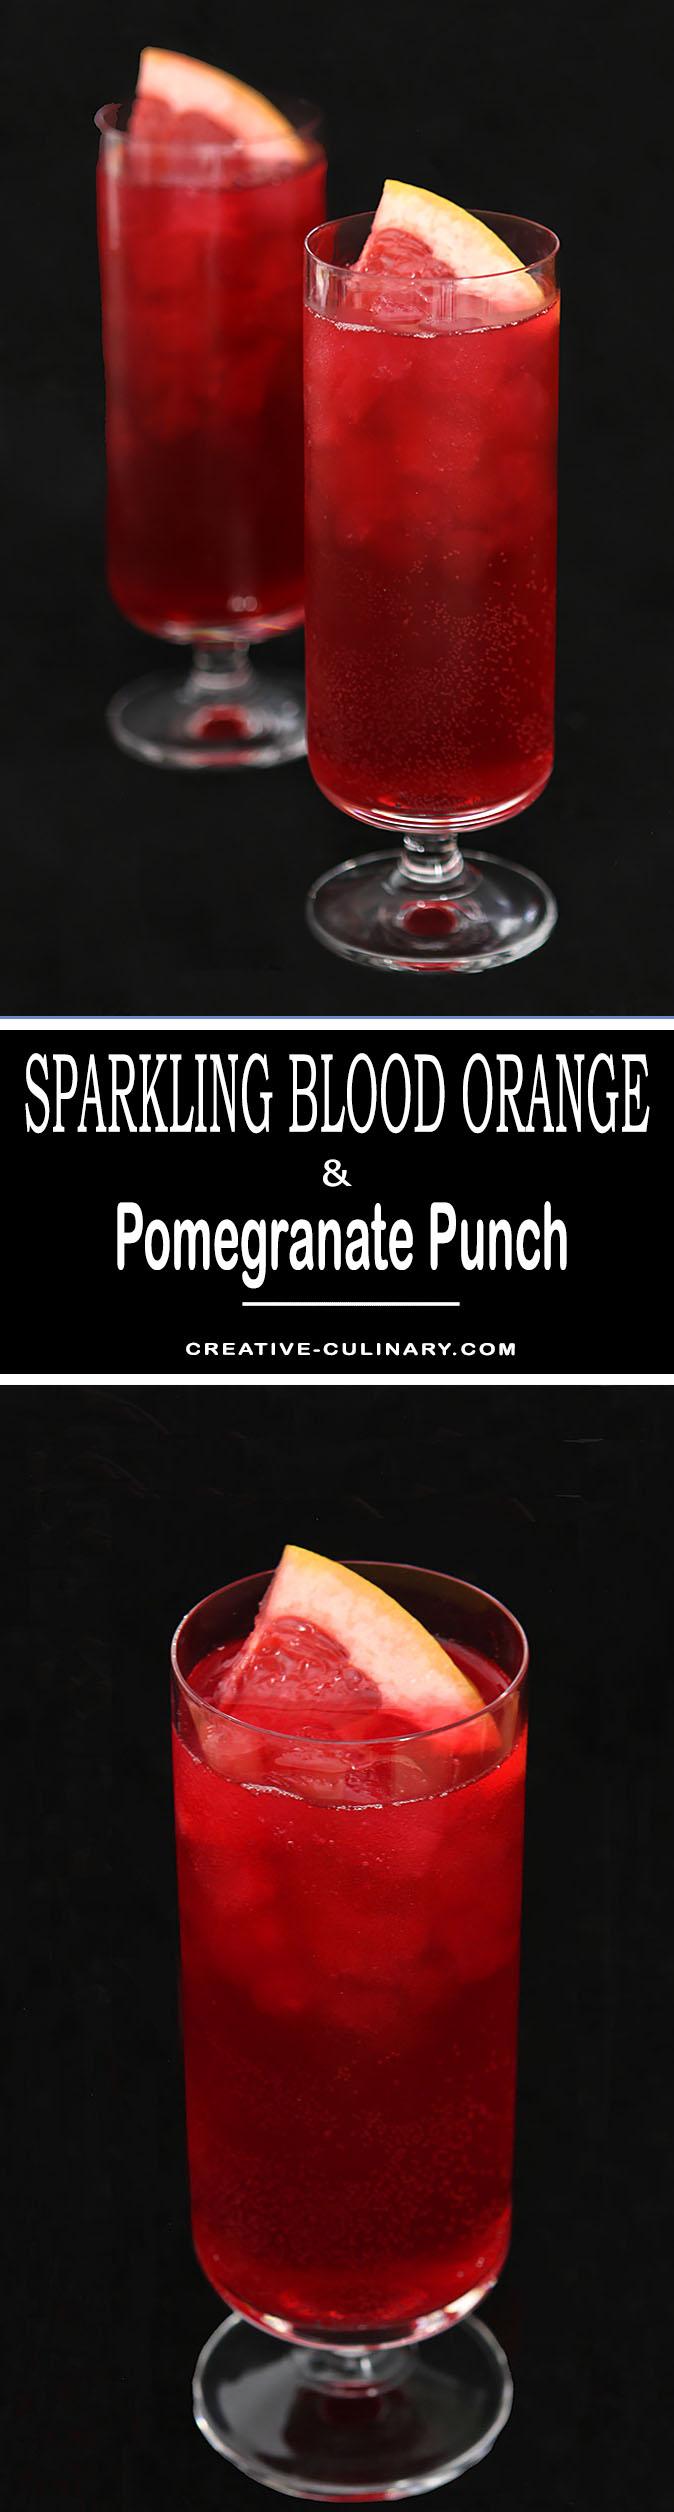 Sparkling Blood Orange and Pomegranate Punch